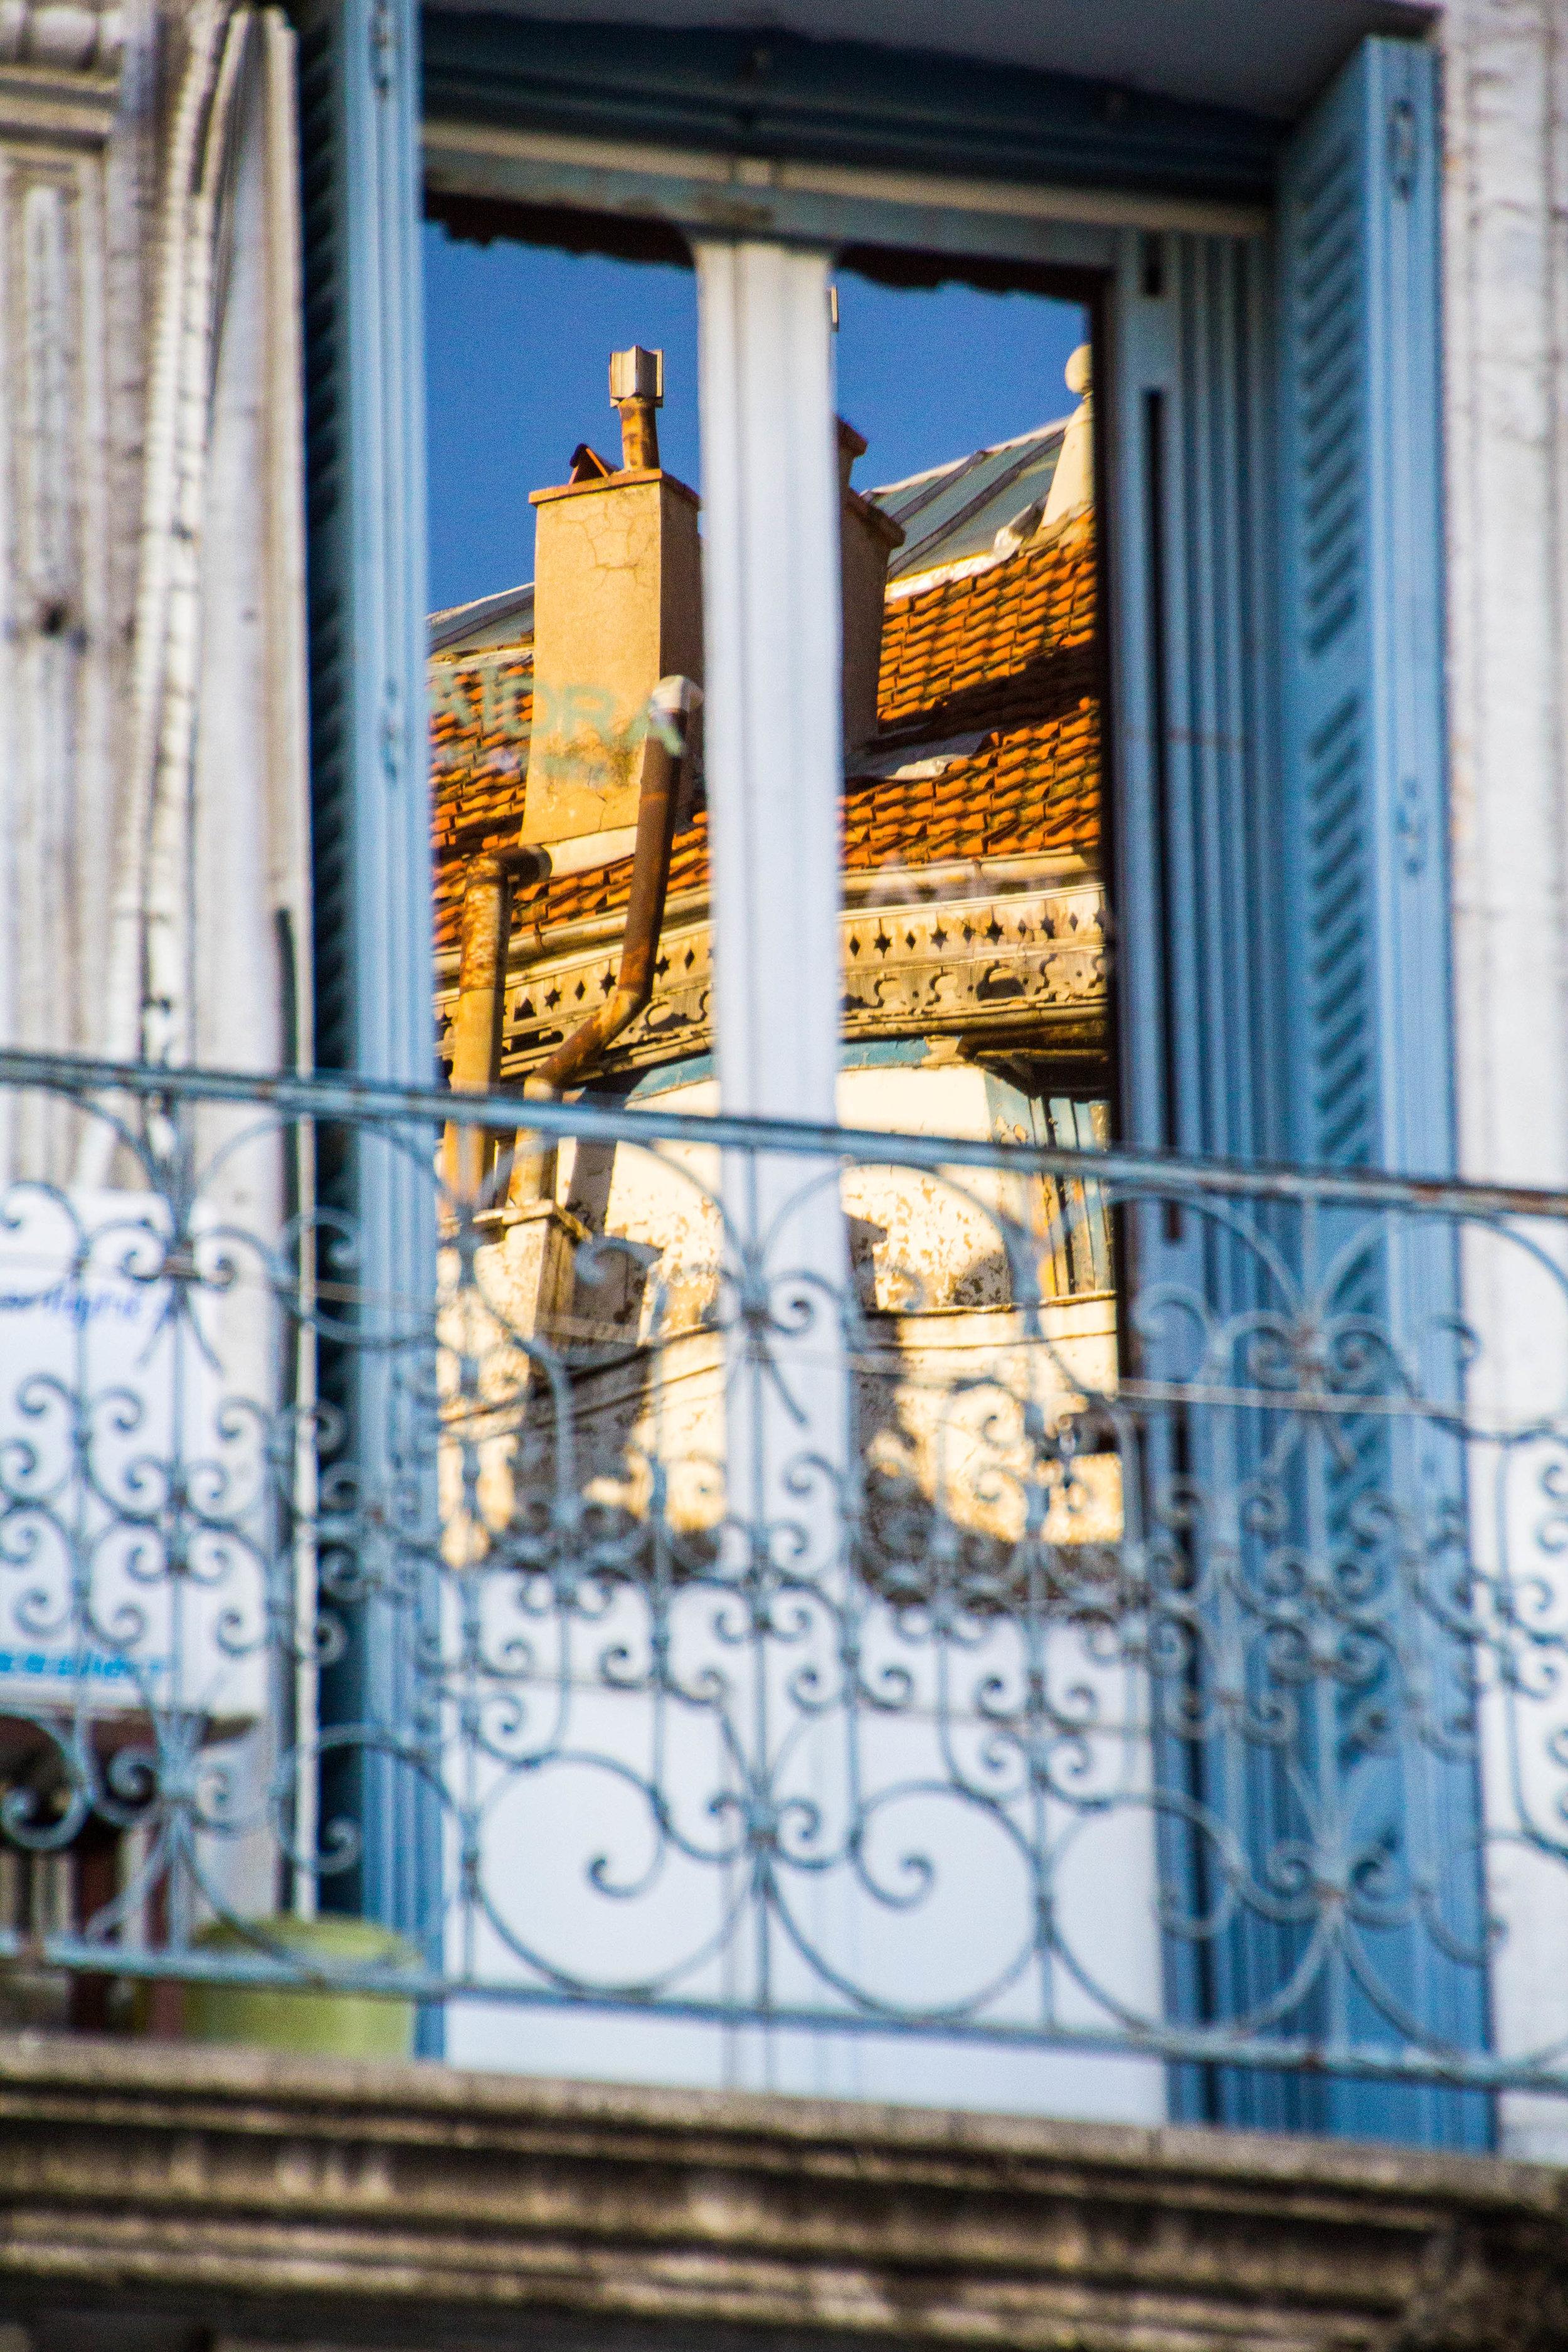 streets-algiers-algeria-28-2.jpg